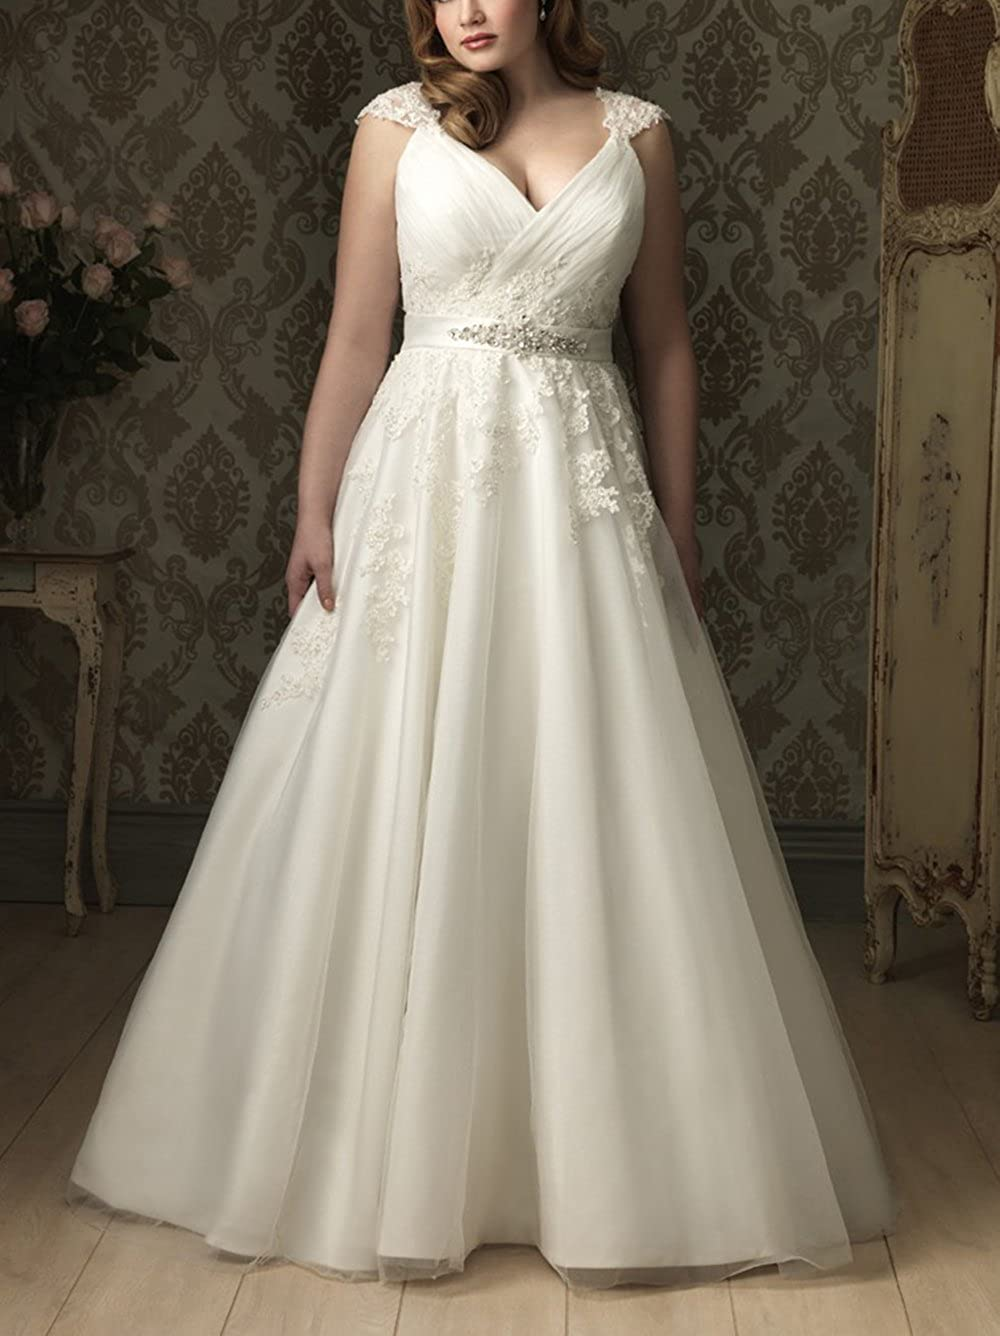 DreHouse Womens A Line V Neck Cap Sleeves Wedding Dresses Plus Size